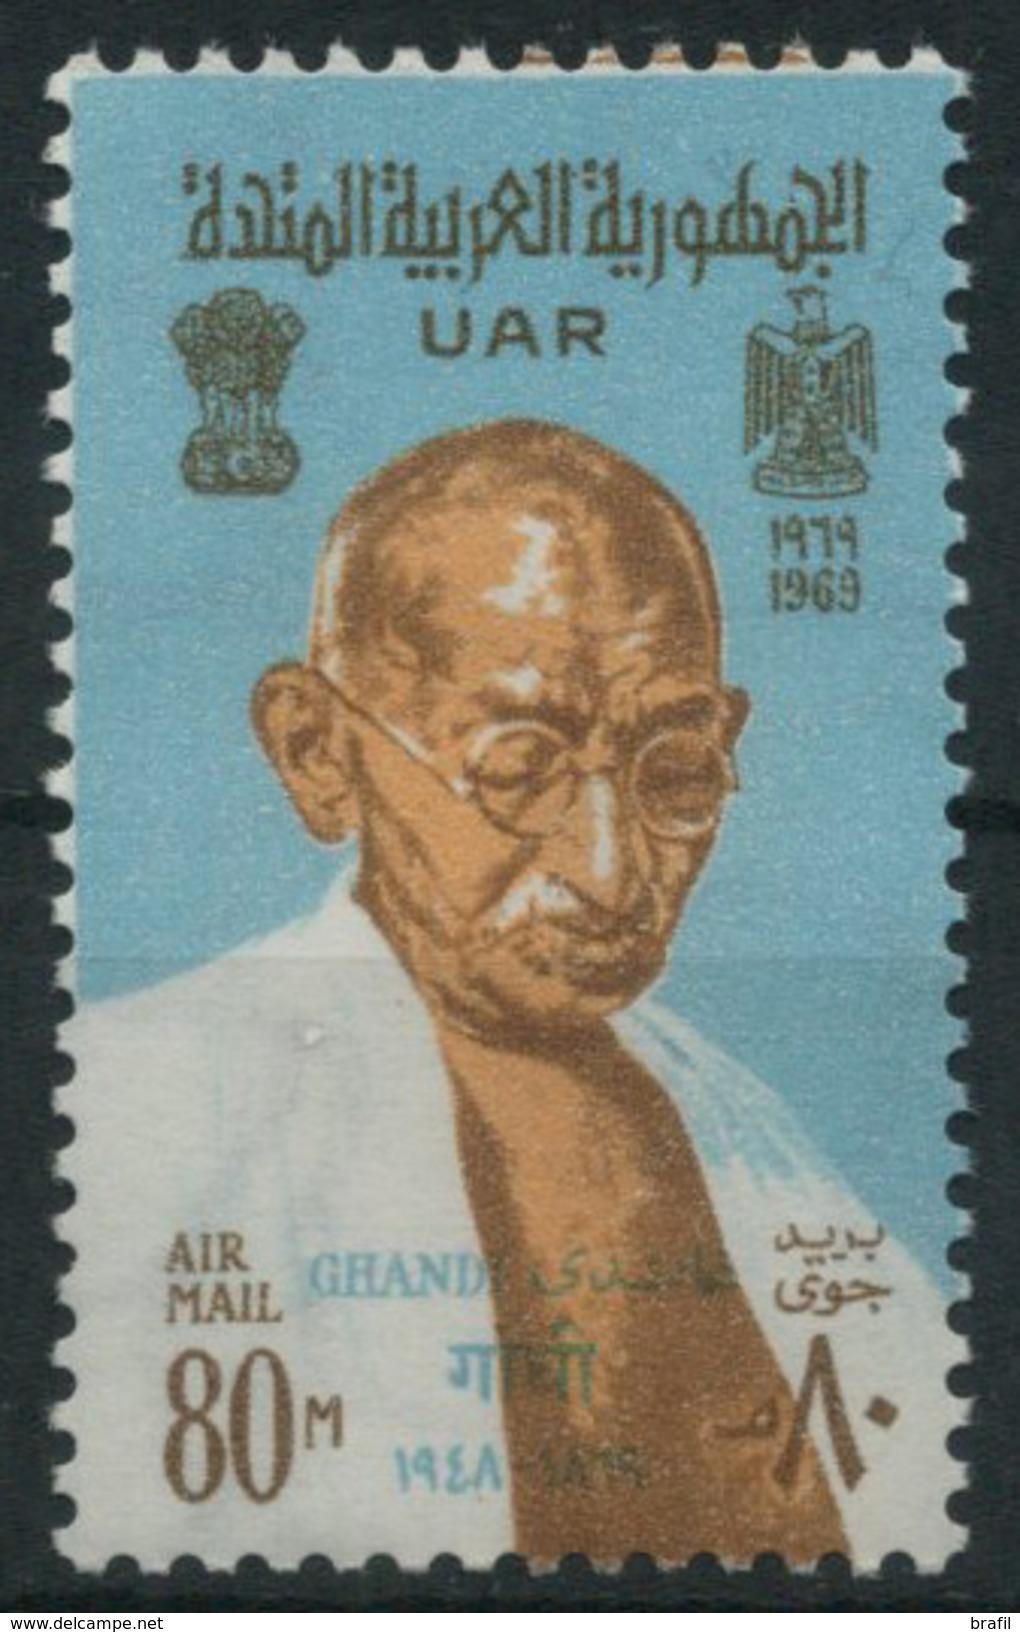 1969 Egitto, Mahatma Gandhi Posta Aerea, Serie Completa Nuova (**) - Posta Aerea